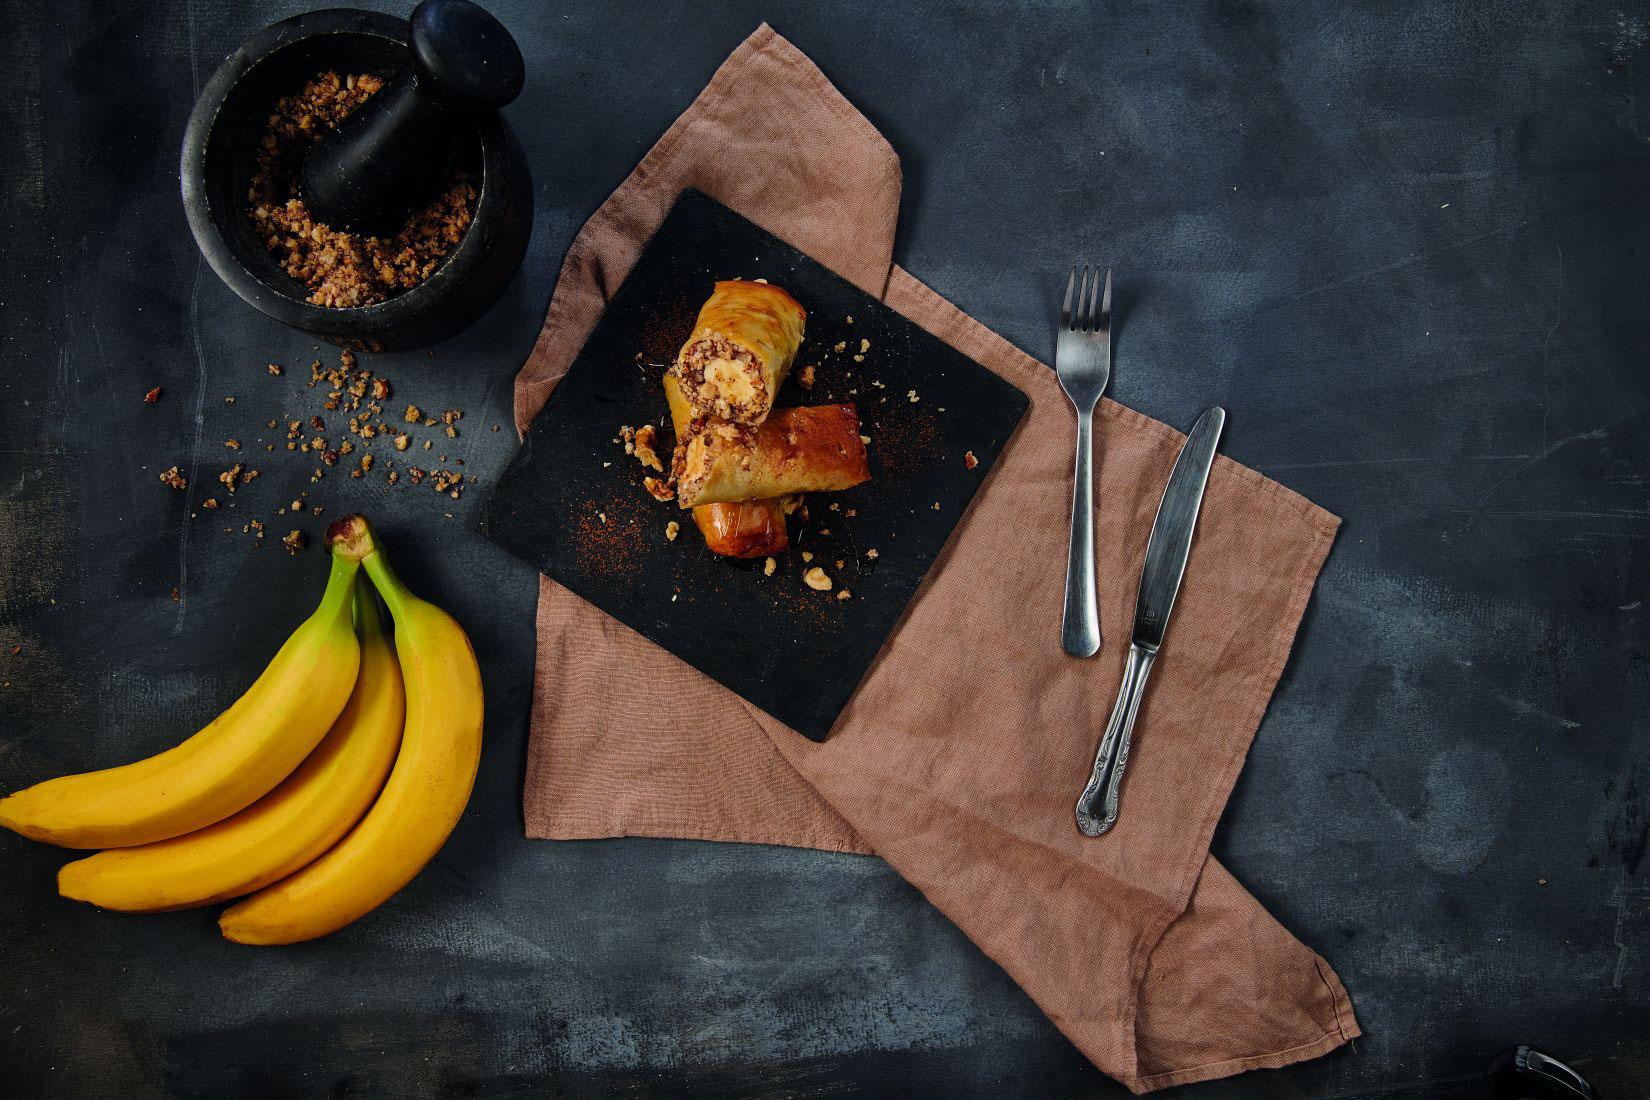 Spring Rolls με Μπανάνα και Ξηρούς Καρπούς σε φύλλο Κρούστας για Γλυκά Χρυσή Ζύμη